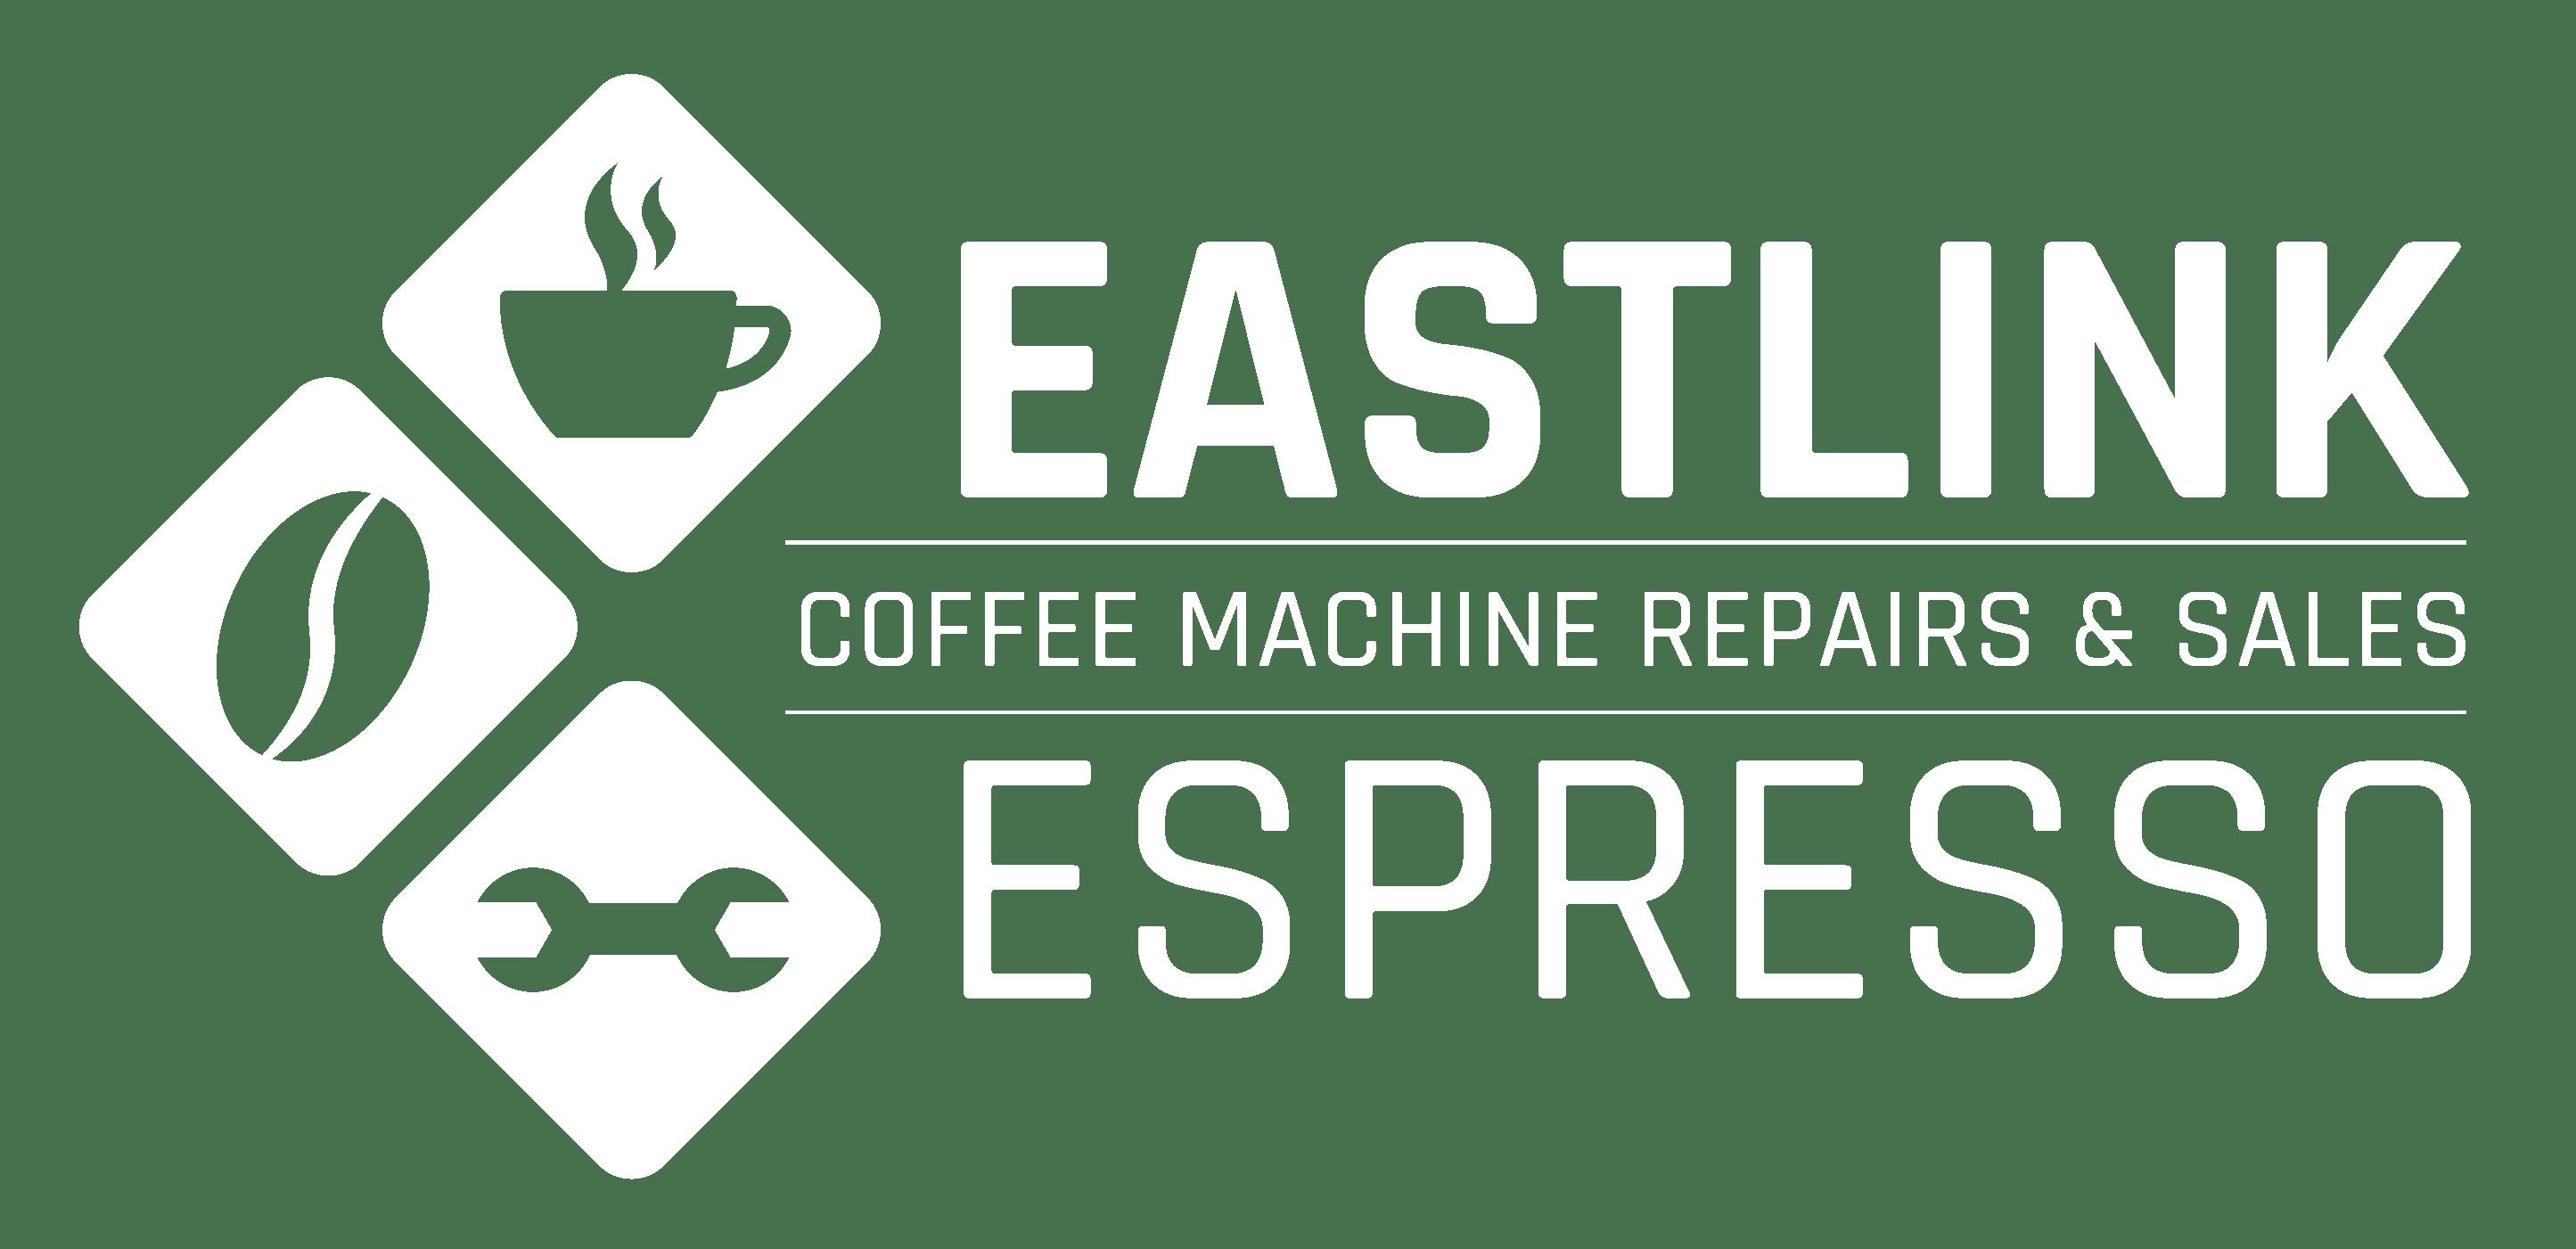 Eastlink Espresso